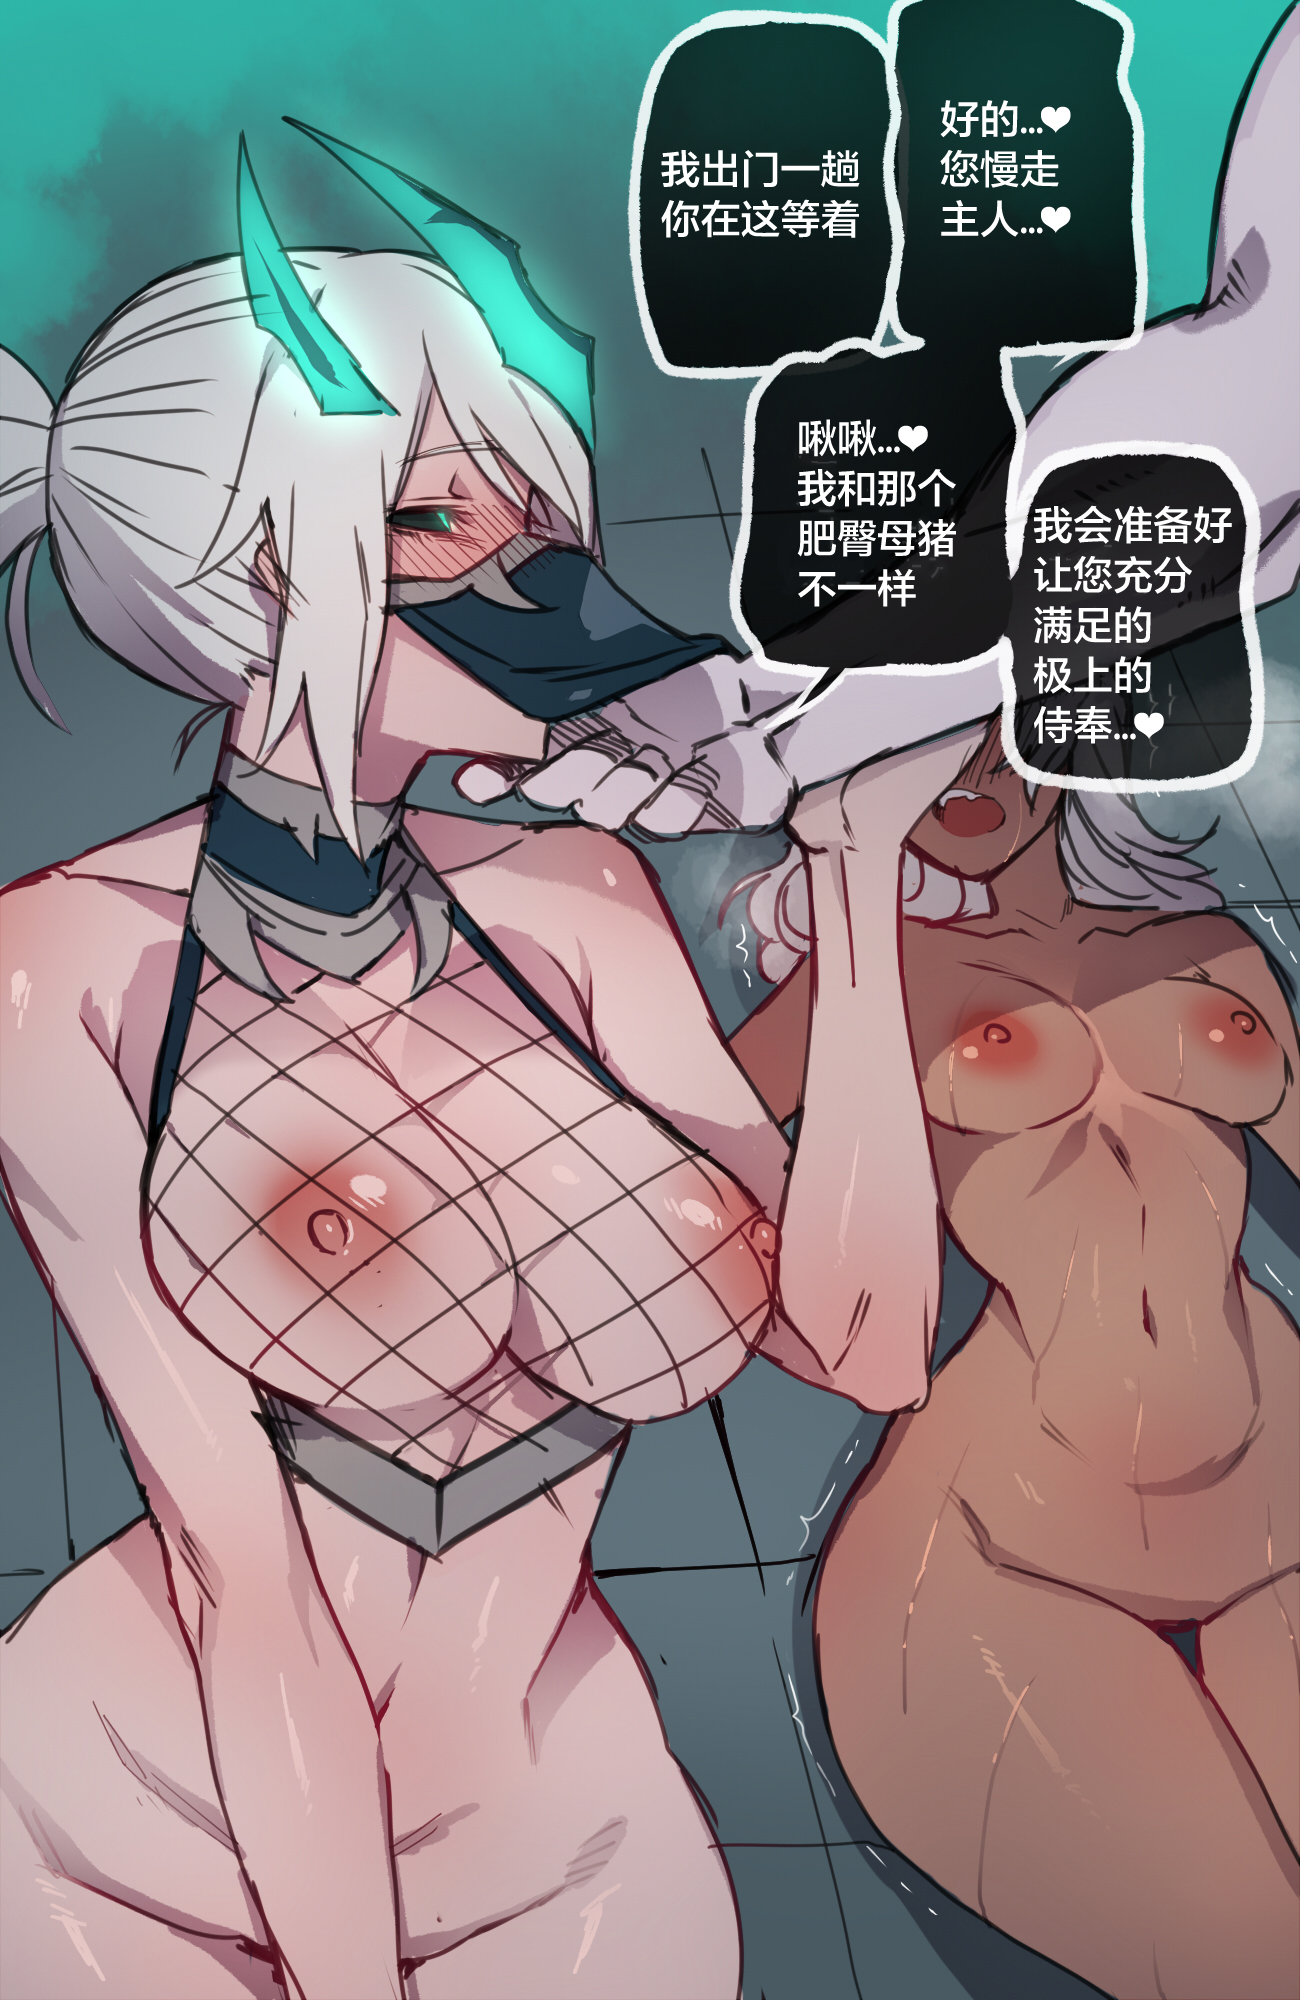 [CN - DOUJIN] Ratatatat74 ~ Ruination 2 Hentai